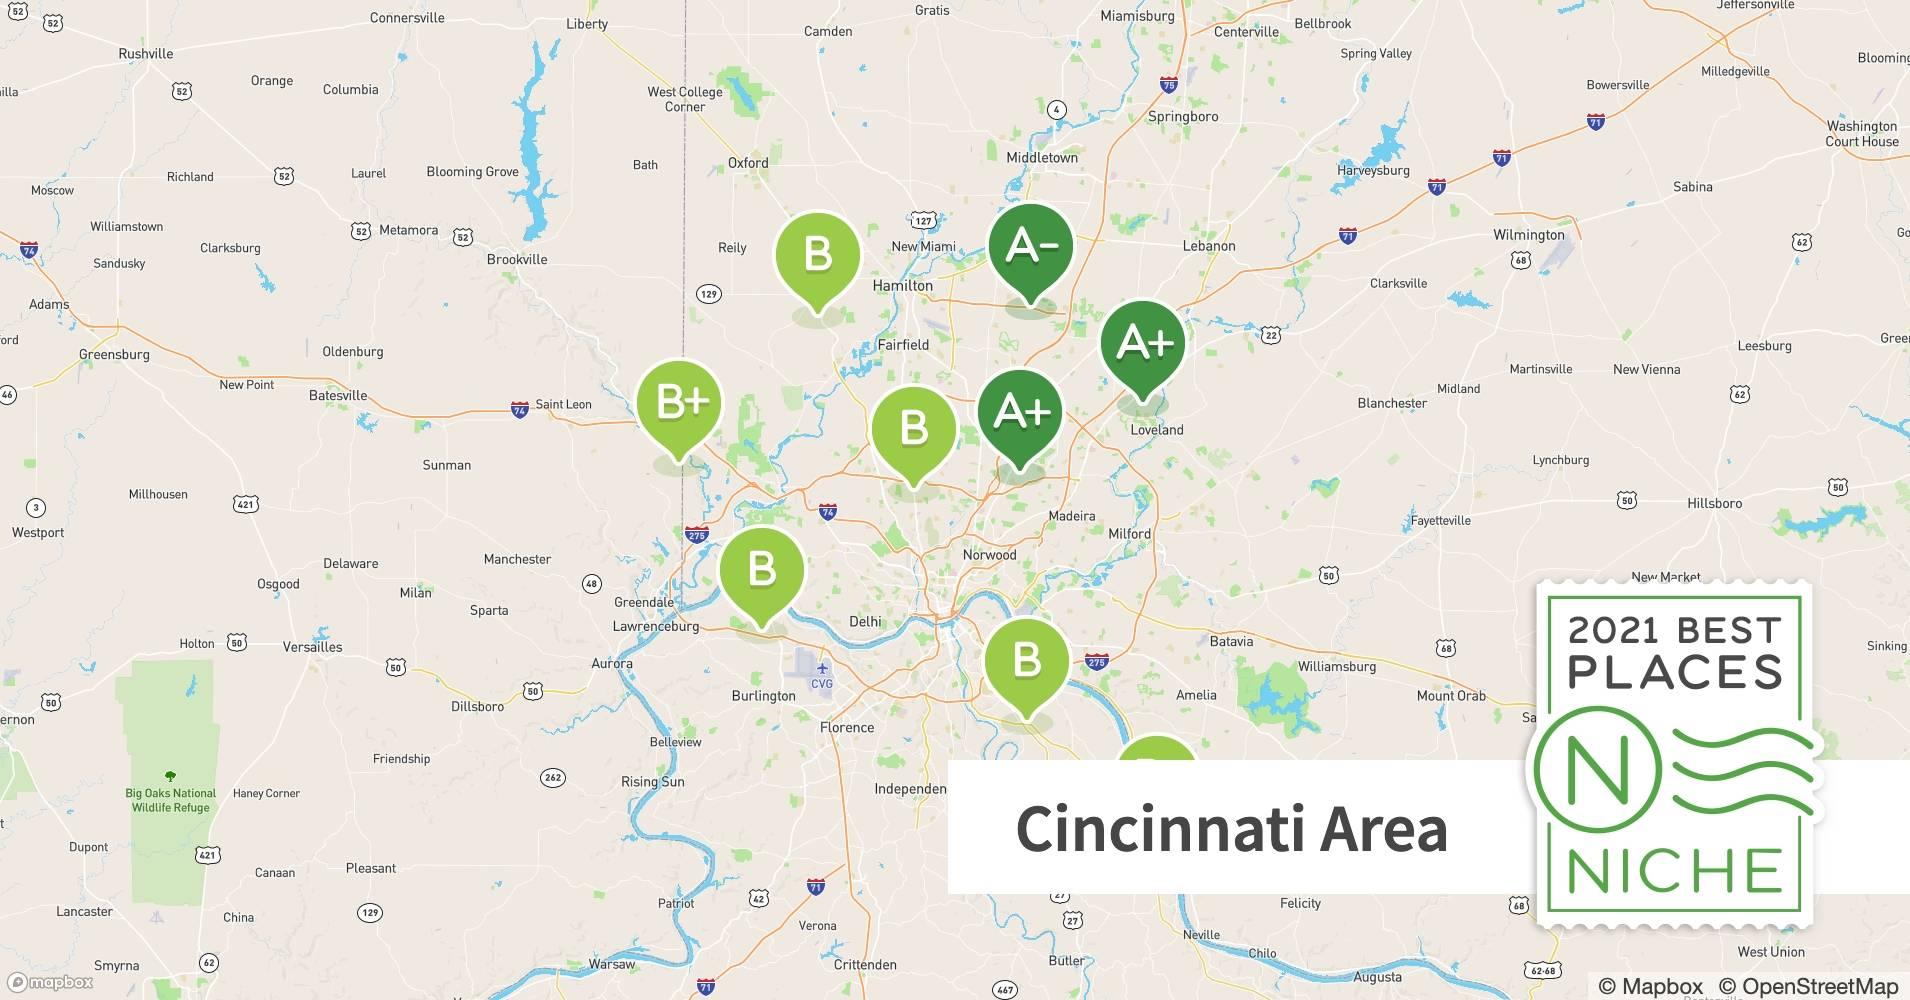 2021 Best Places To Live In The Cincinnati Area Niche